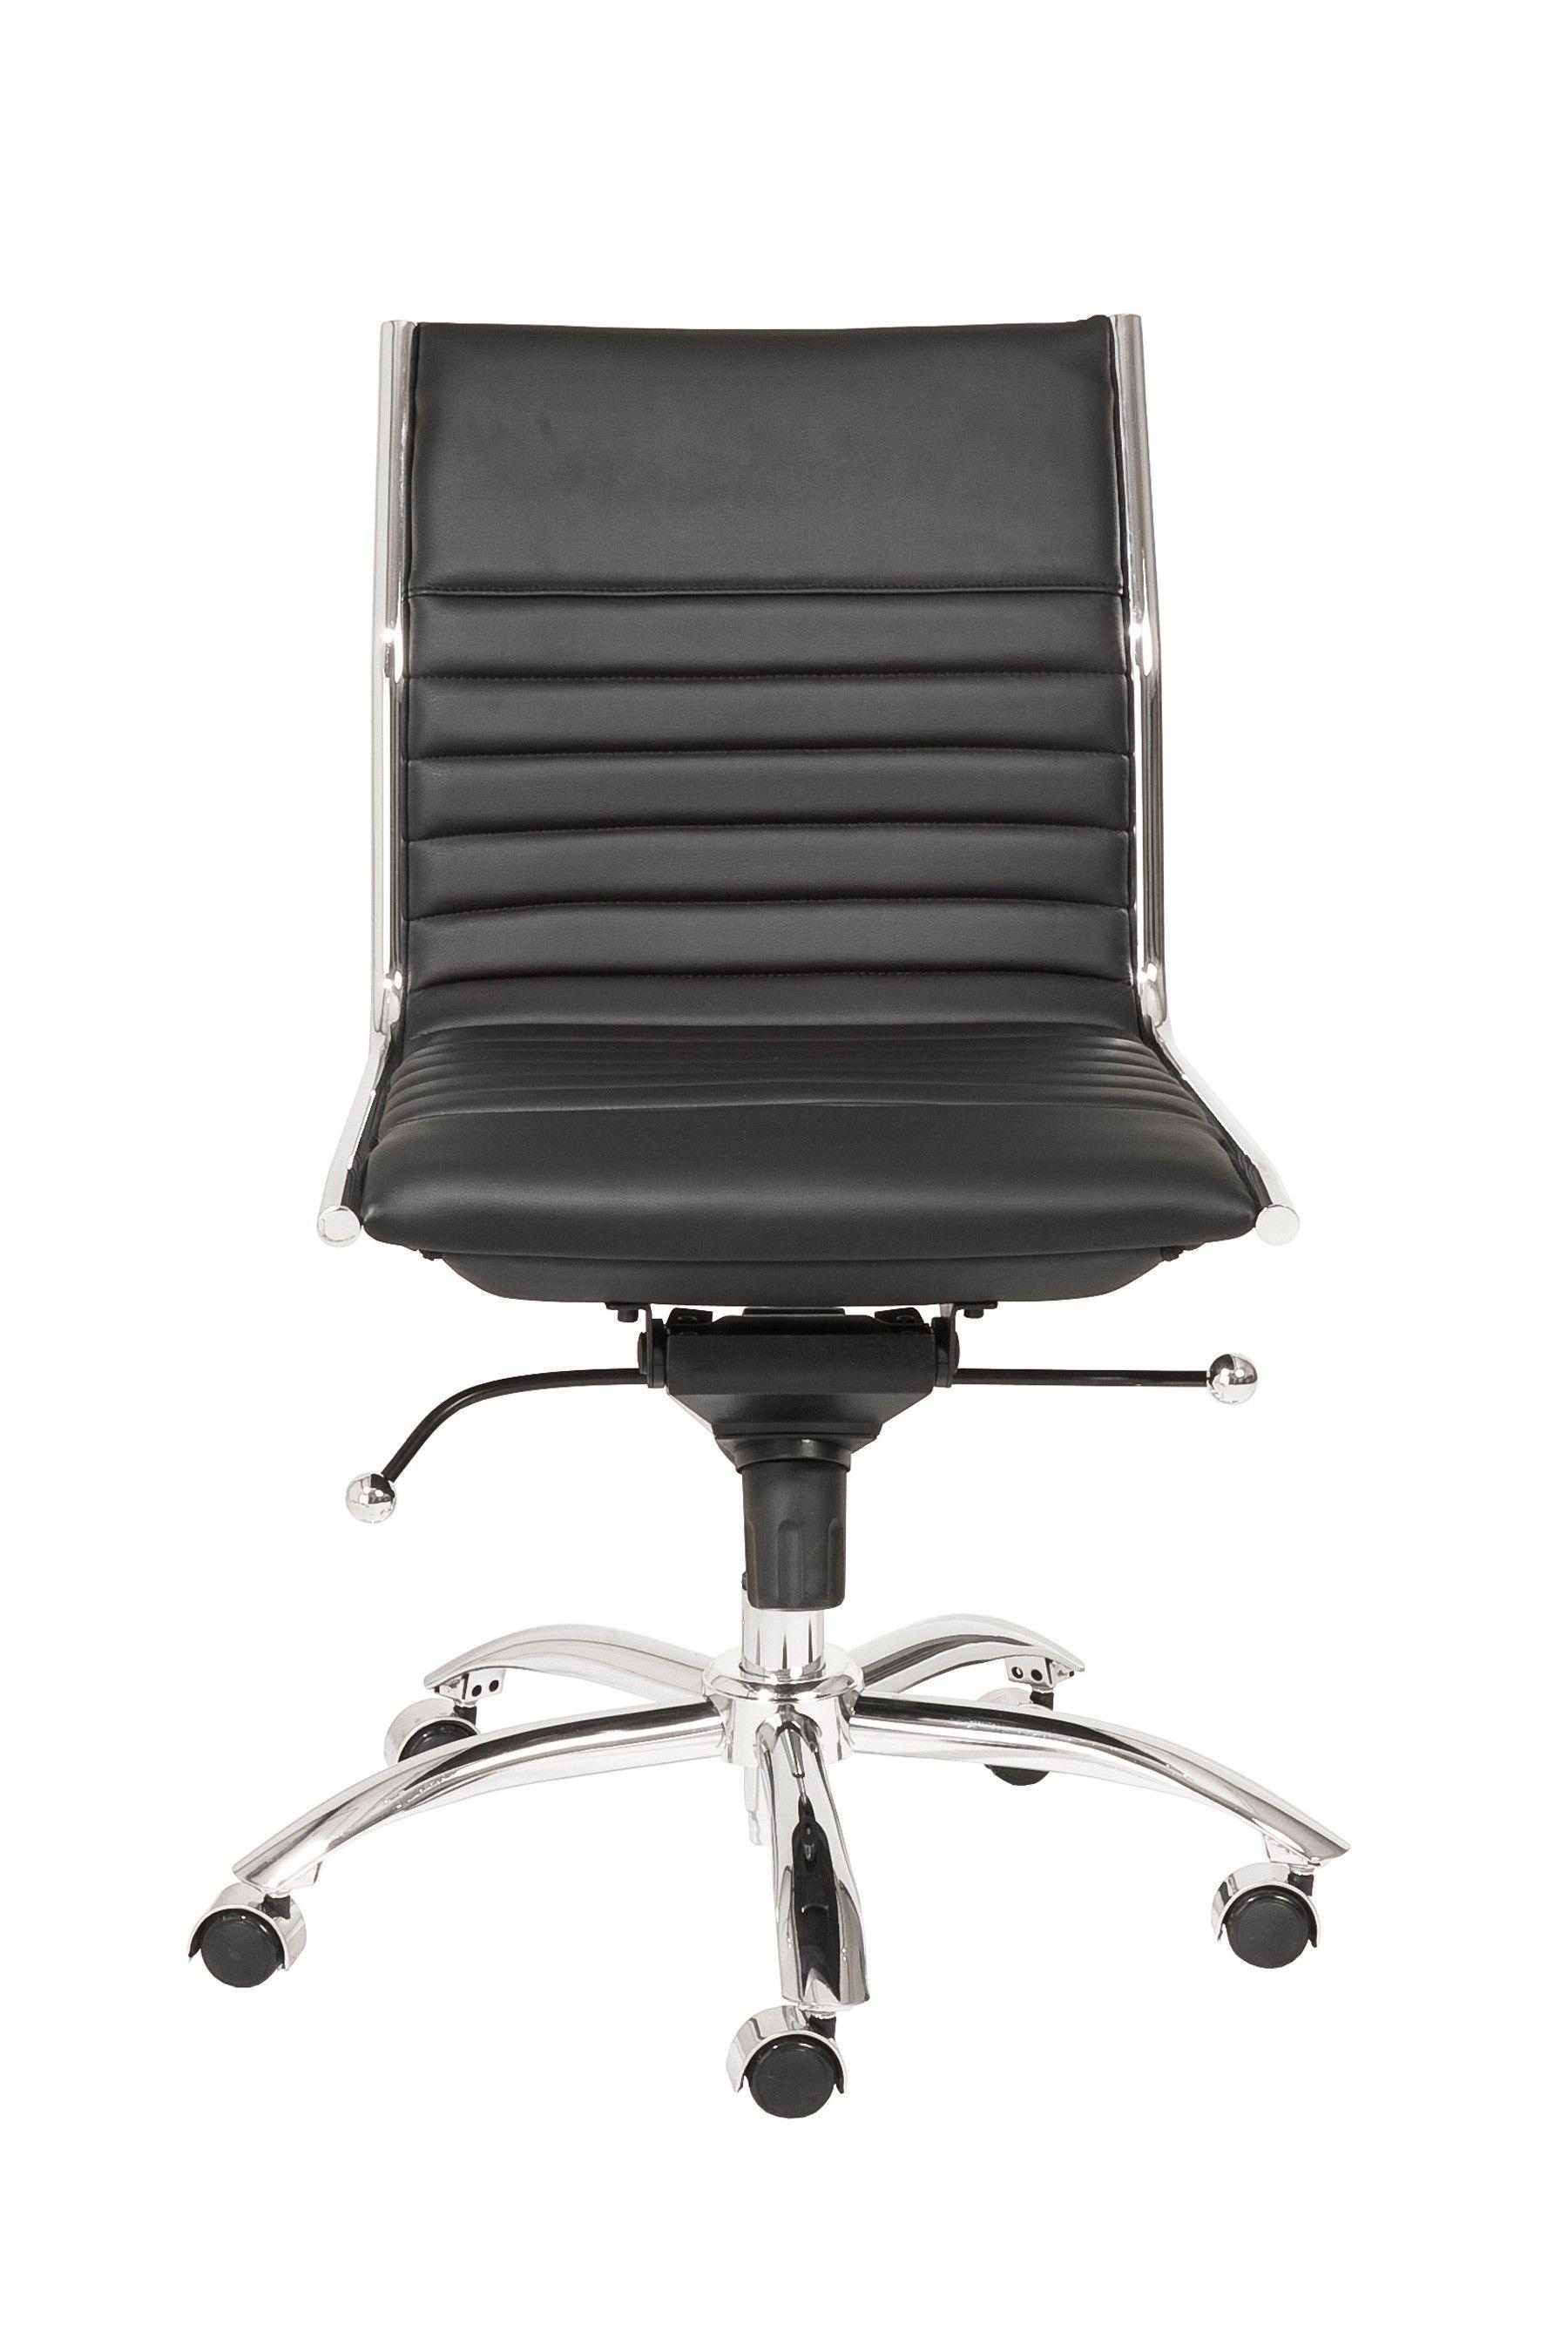 Komfortable Home Office Stuhl Beheizbaren Burostuhl Besten Burostuhl Der Welt Beste Wert Burostuhl Executive Office